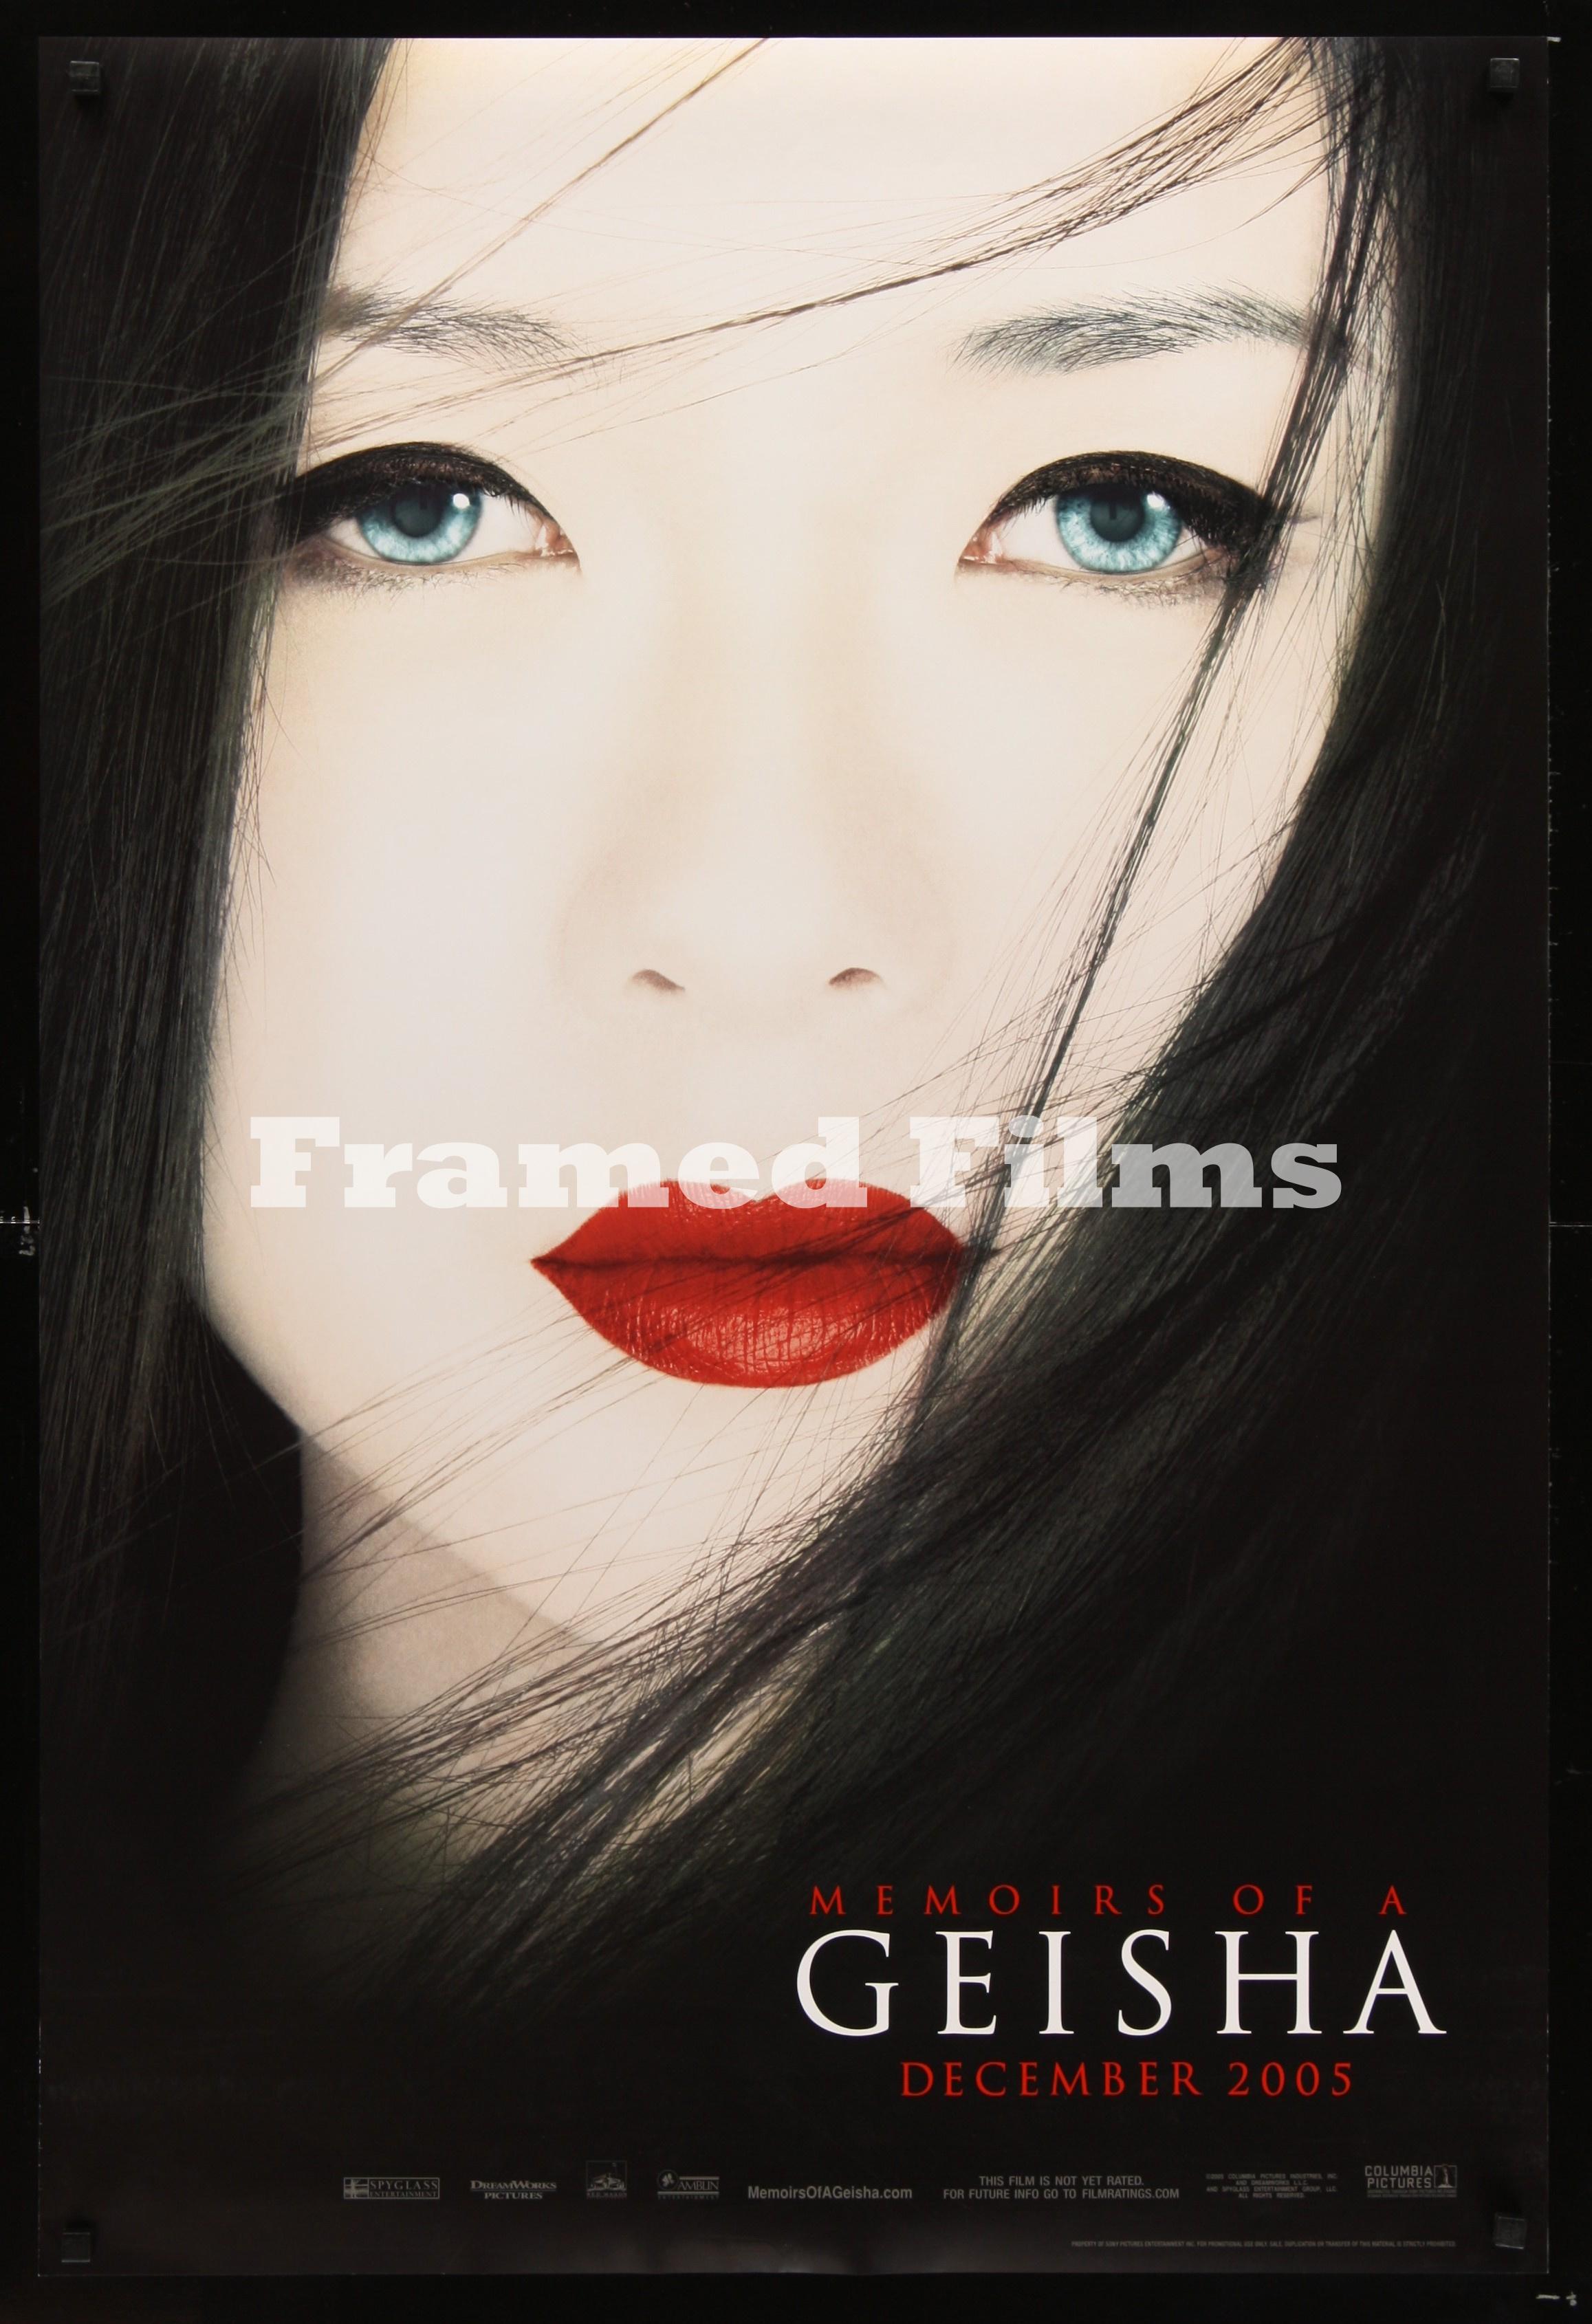 memoirs_of_a_geisha_teaser_dupe1_NZ03105_L.jpg